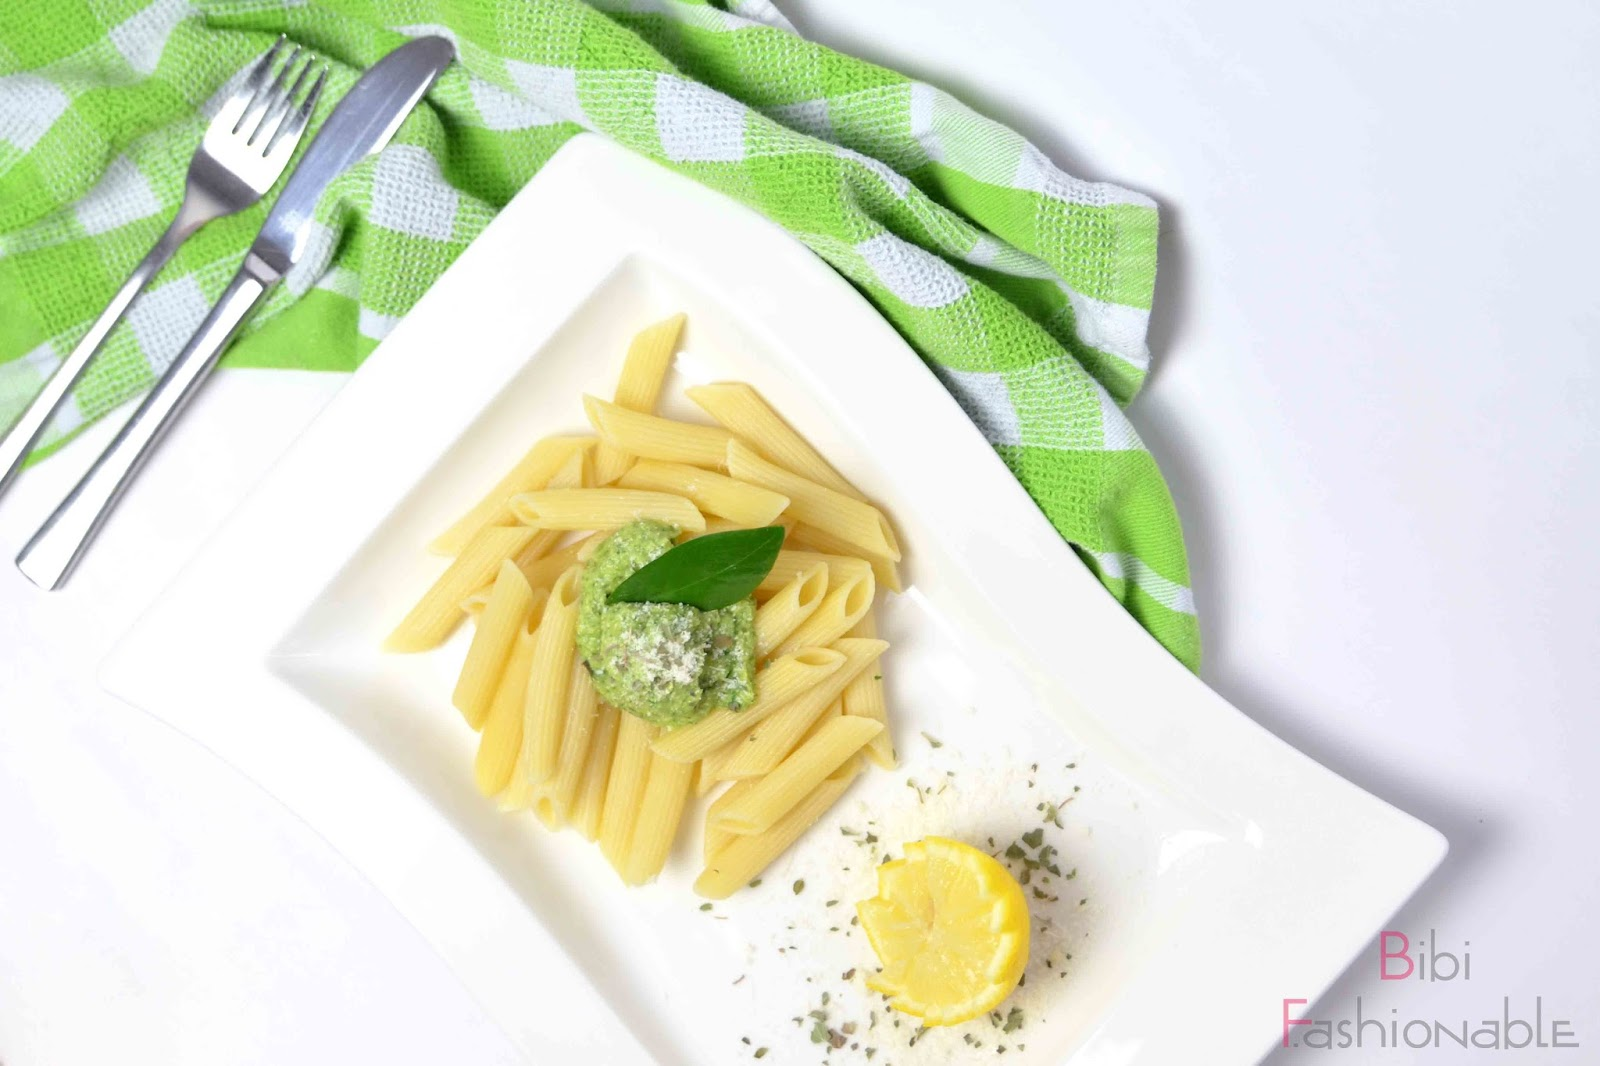 schmackhaftes Avocado-Pesto oben